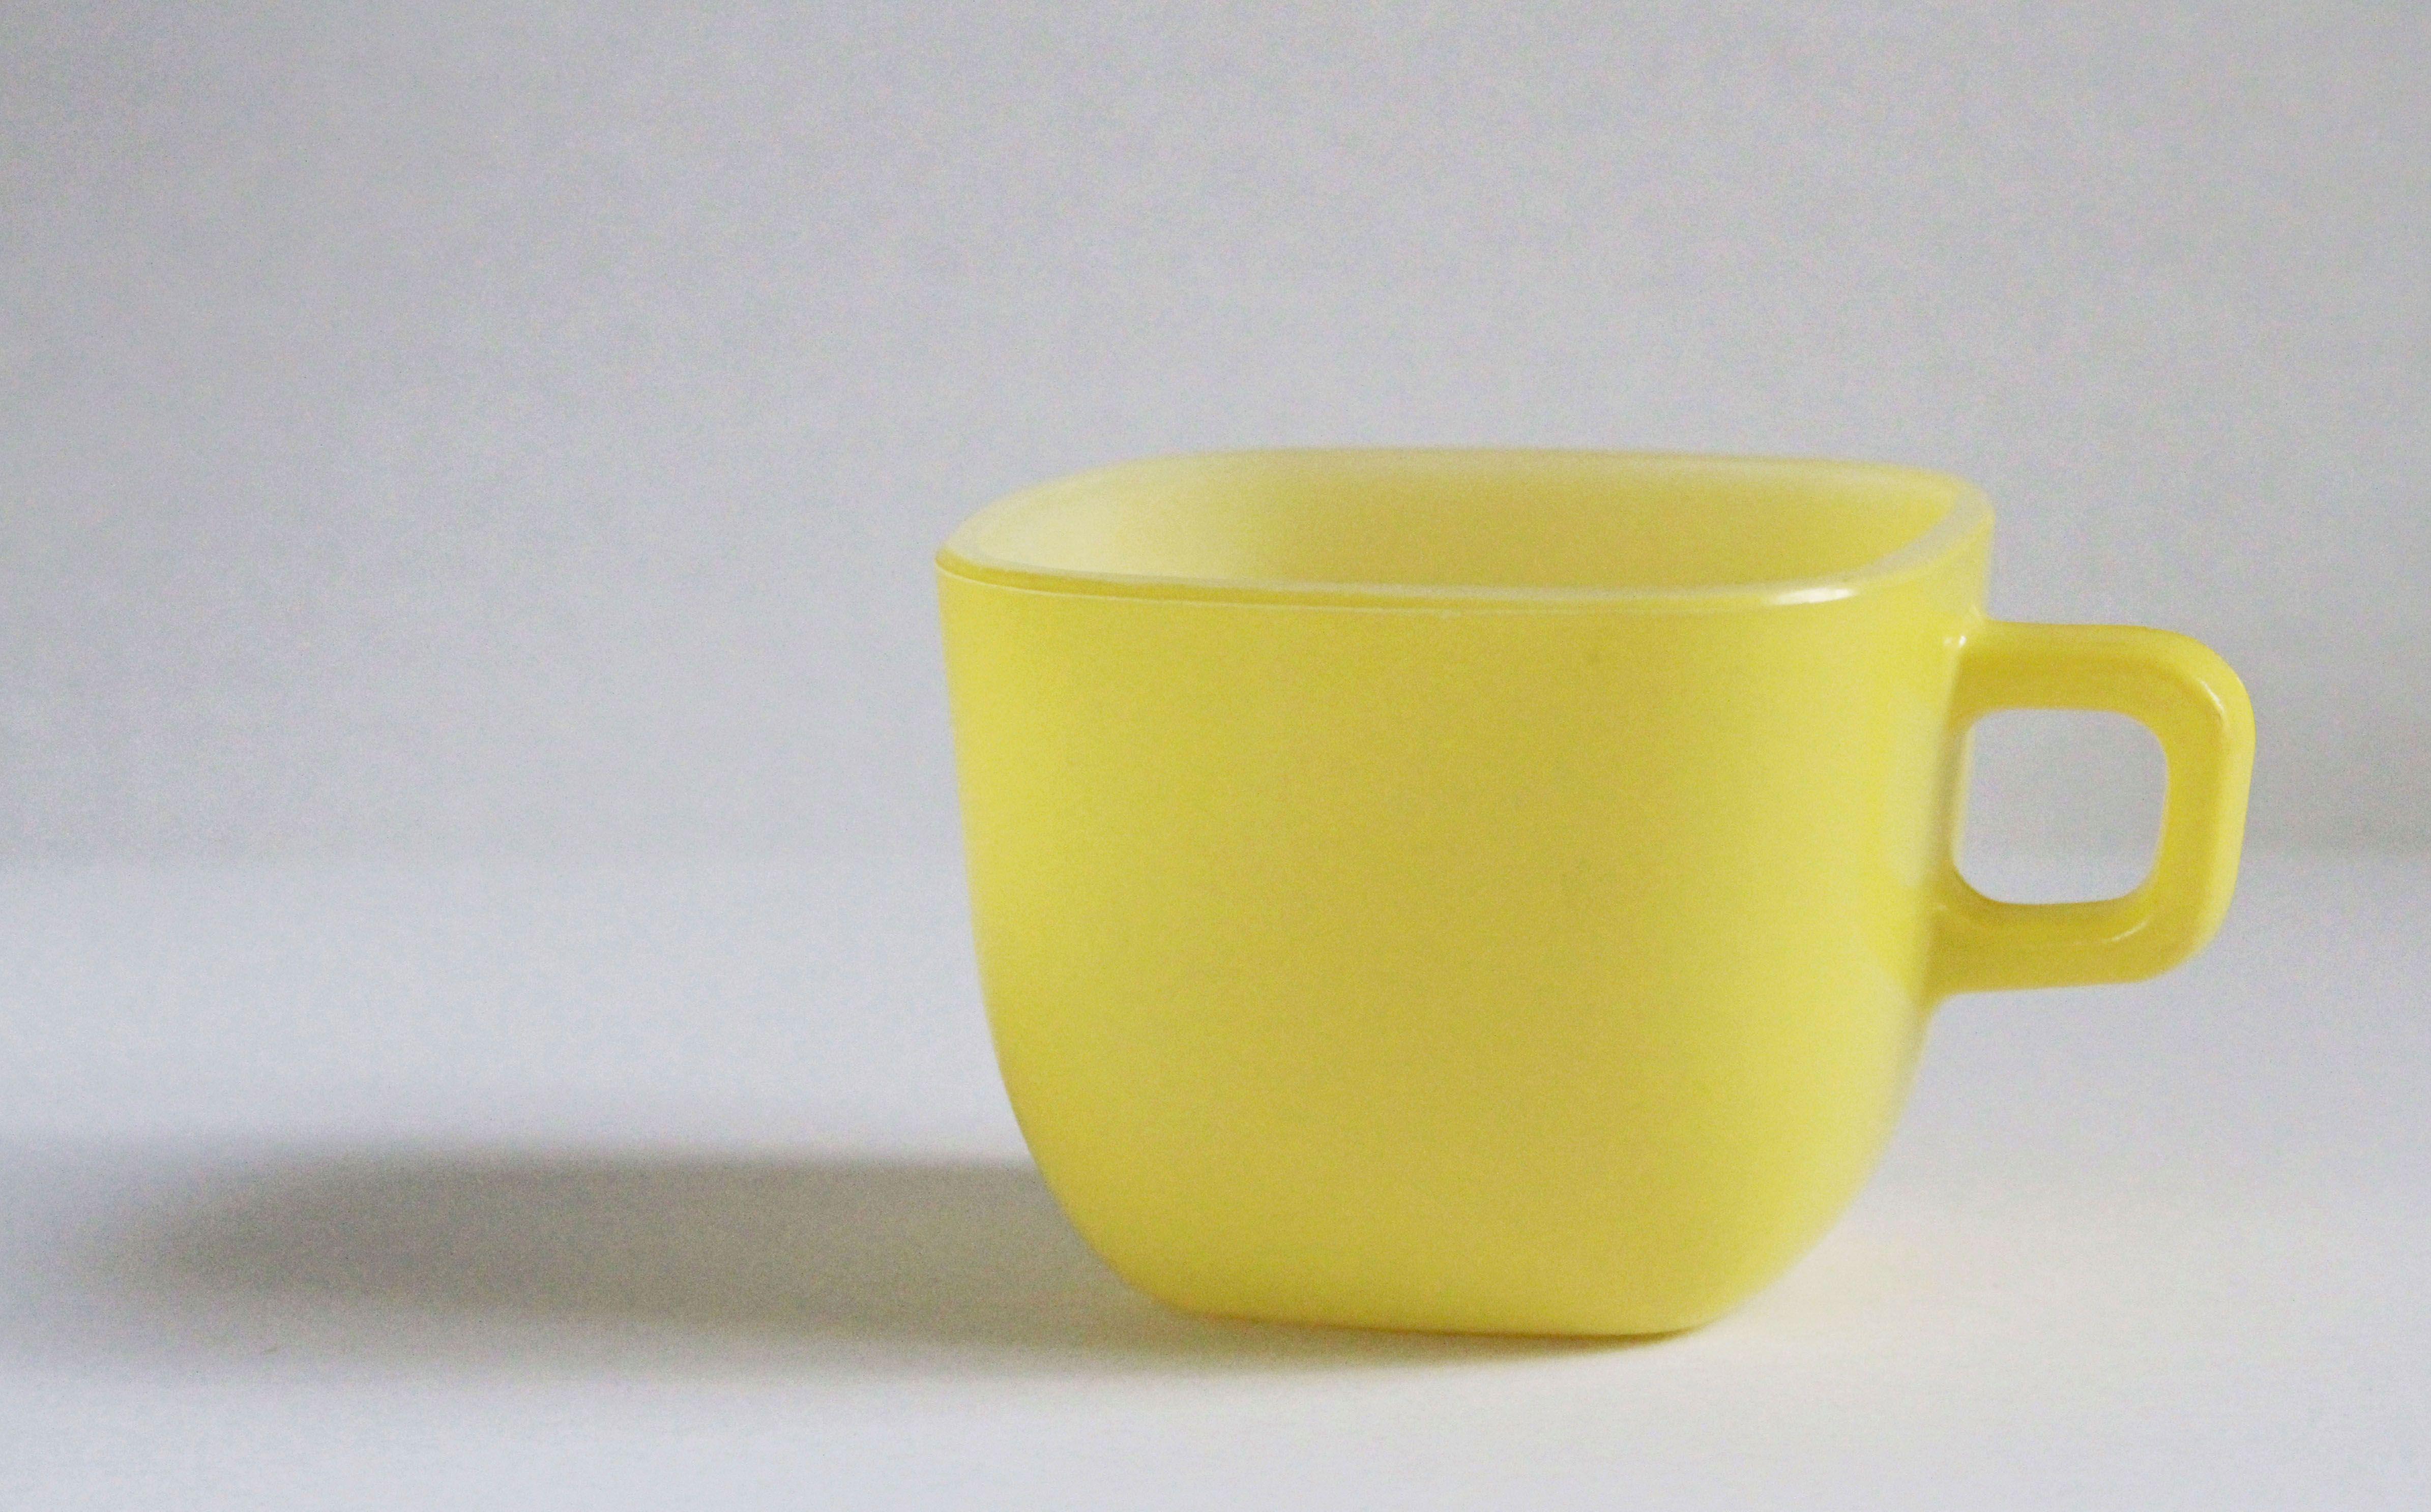 Glasbake yellow Lipton mug found for $0.80